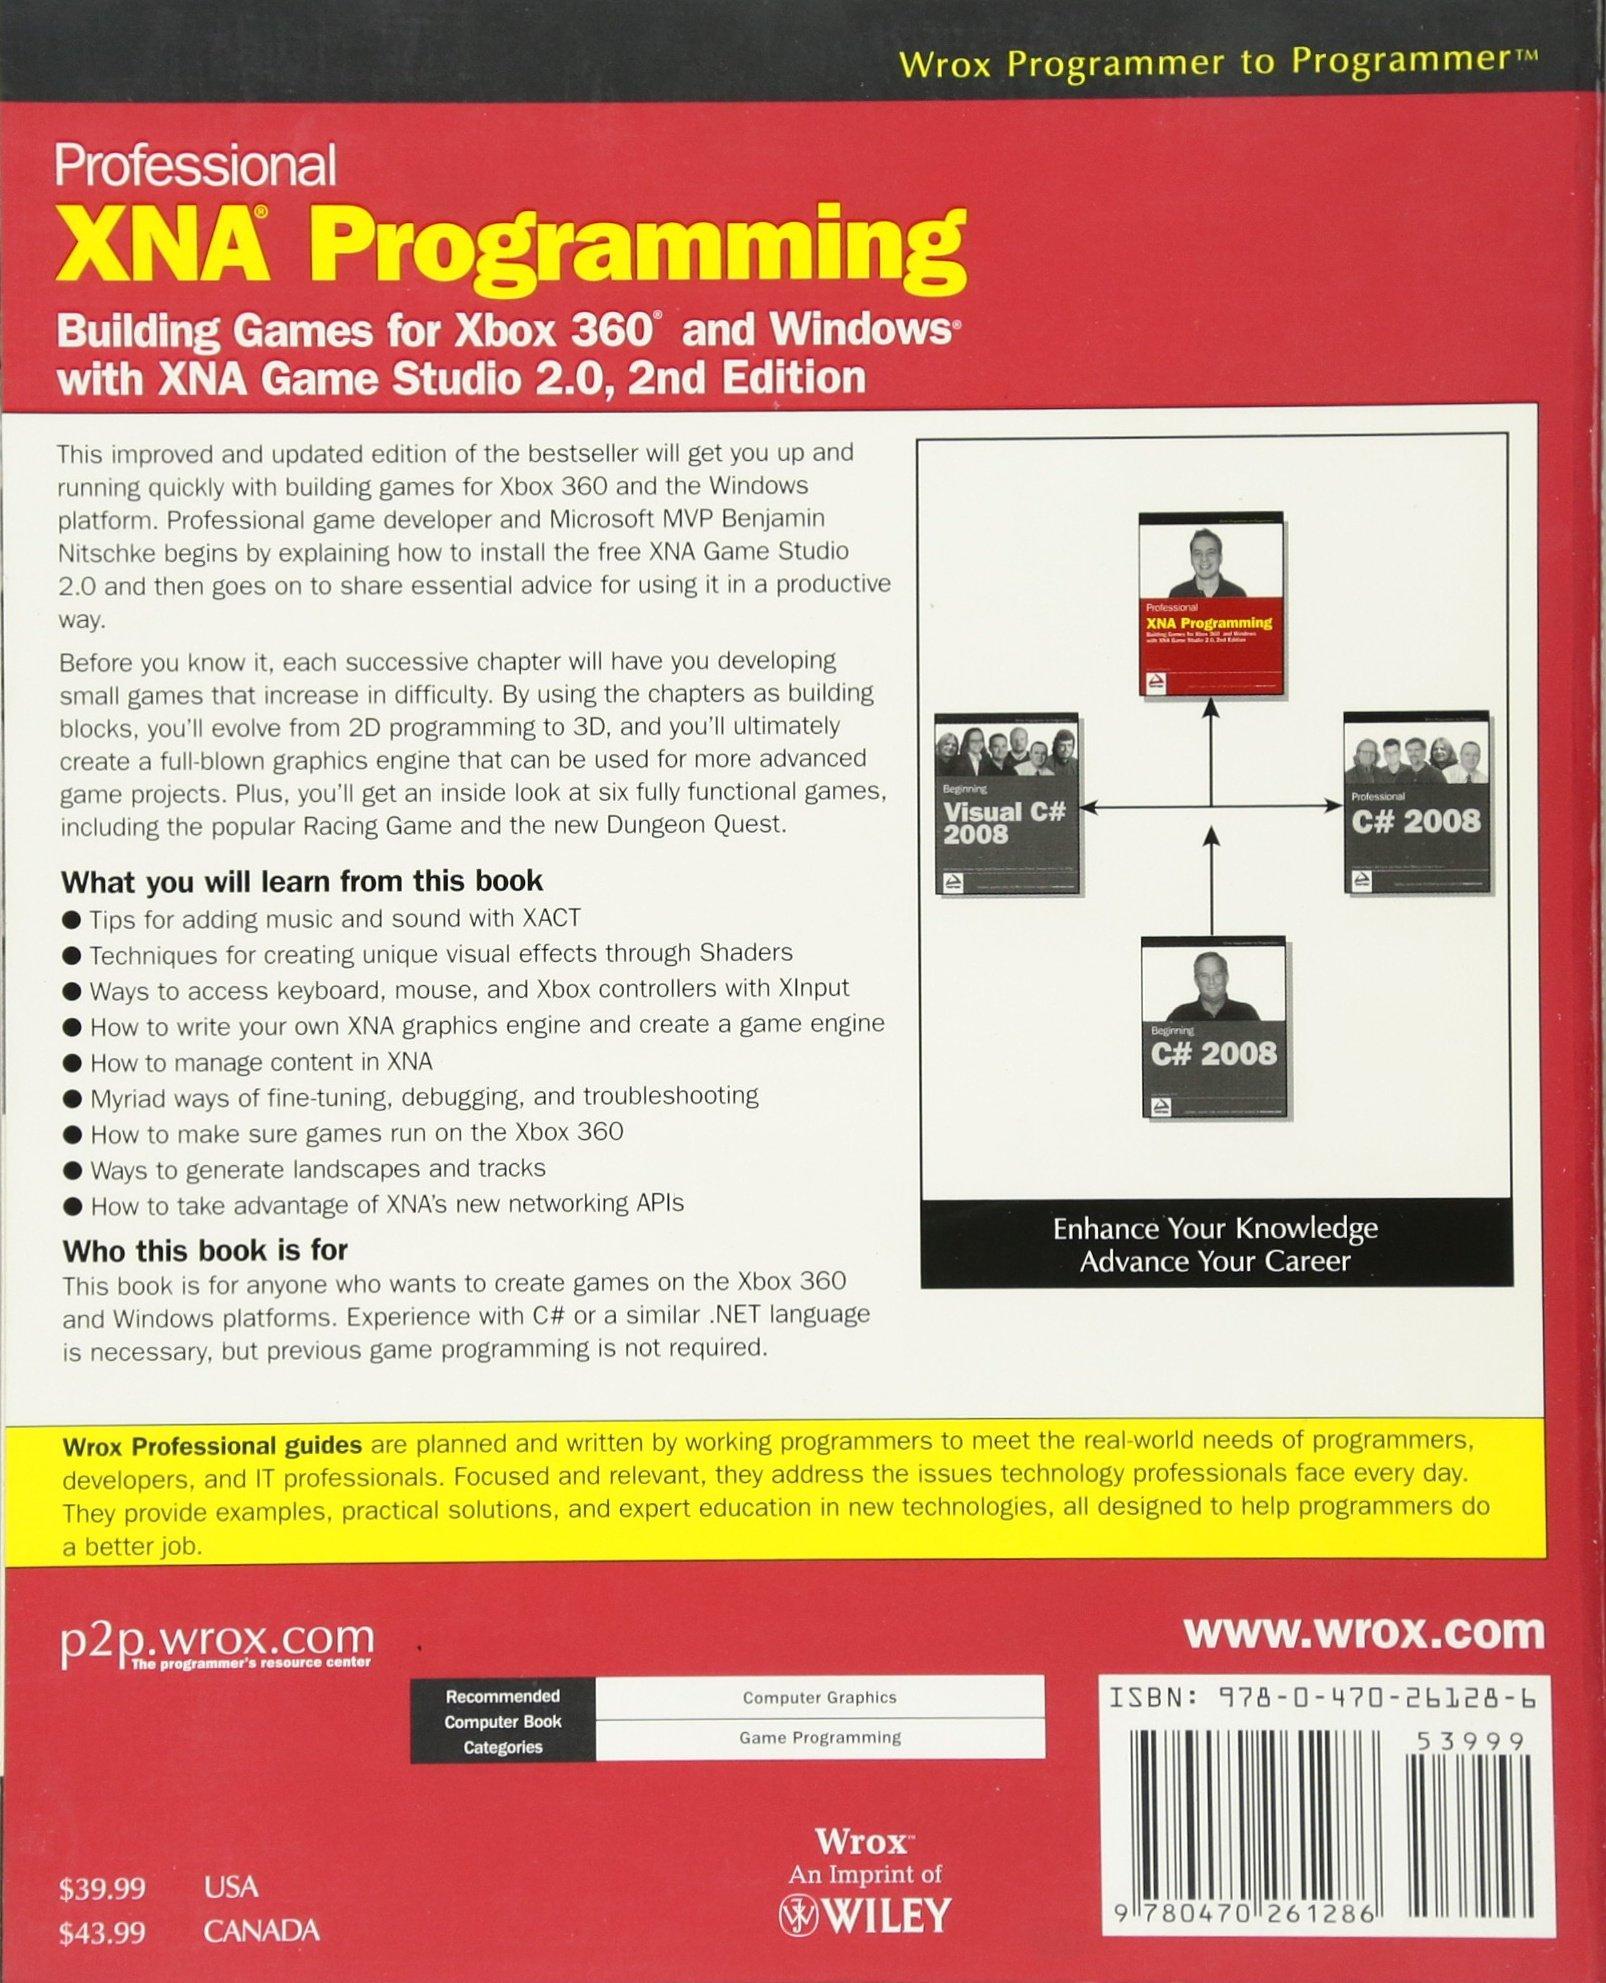 Professional xna programming building games for xbox 360 and windows with xna game studio 2 0 benjamin nitschke 9780470261286 amazon com books